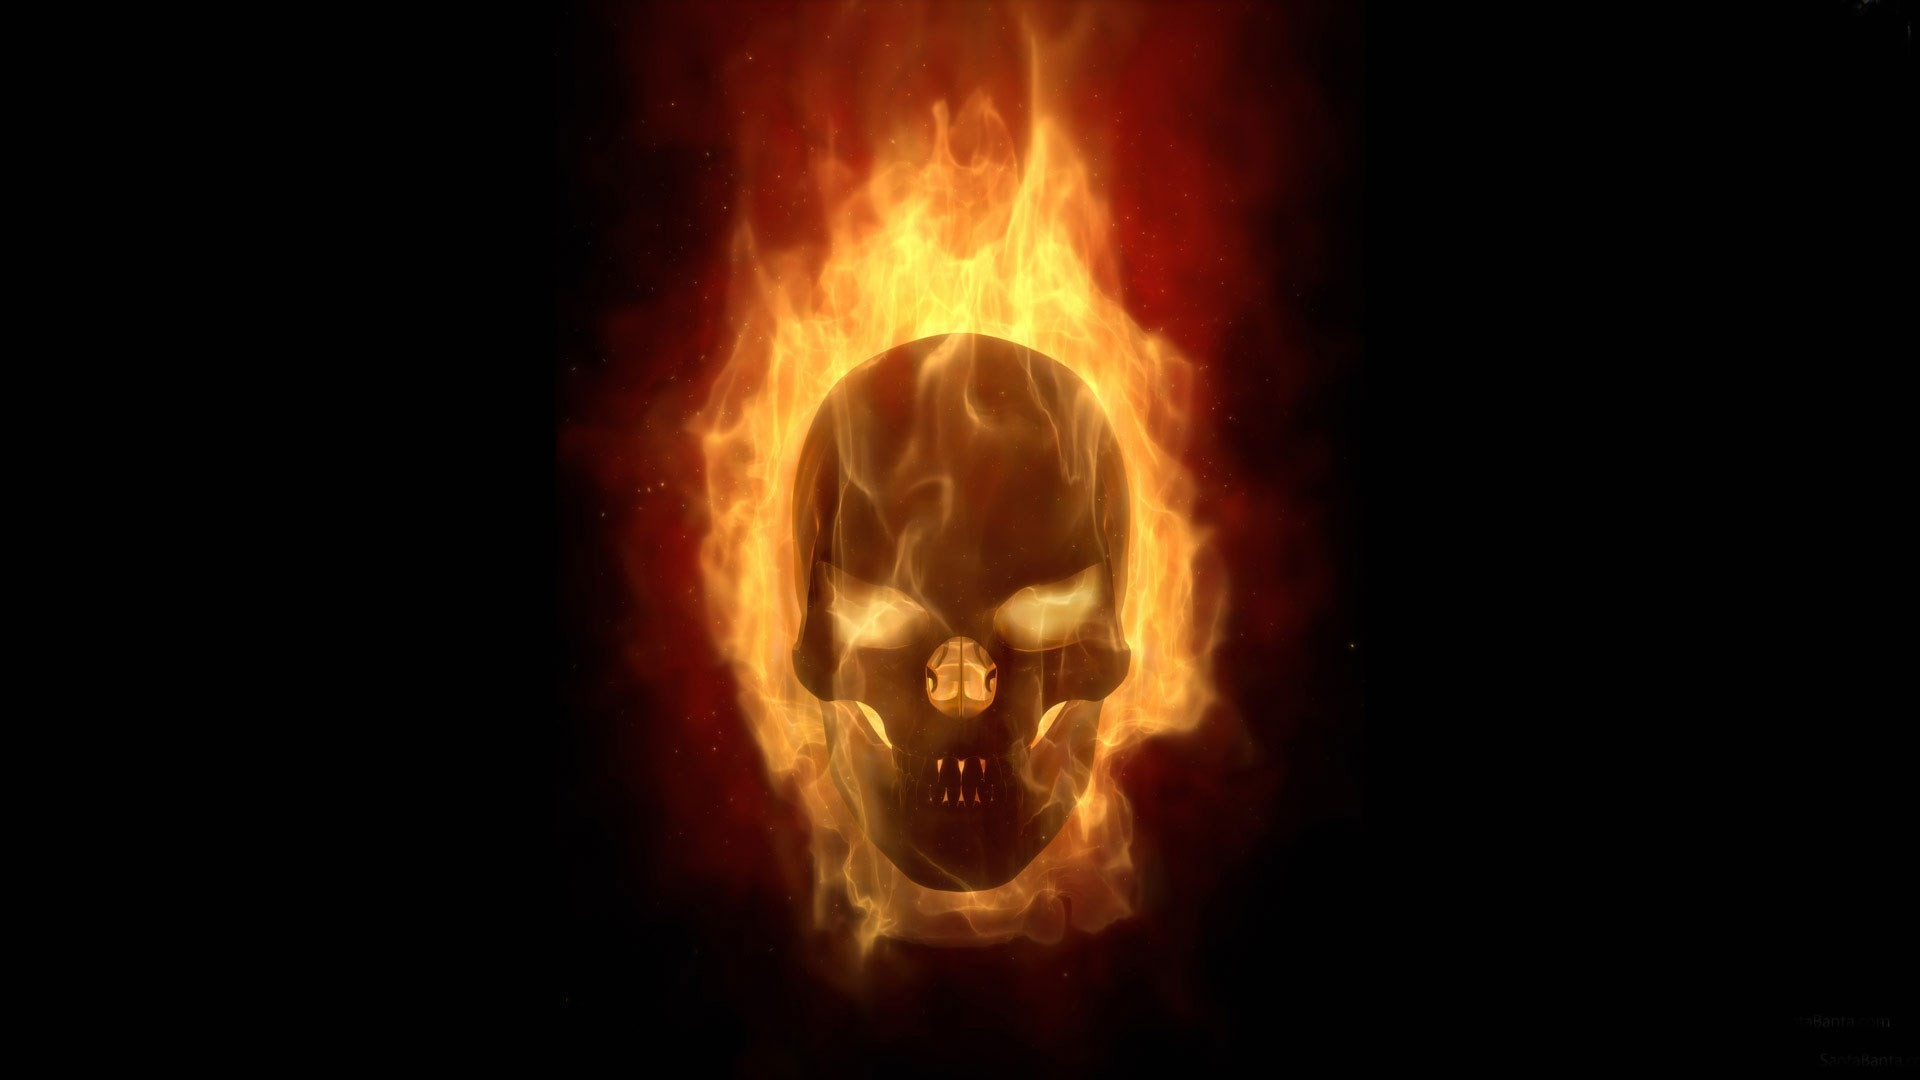 The Punisher Skull On Fire